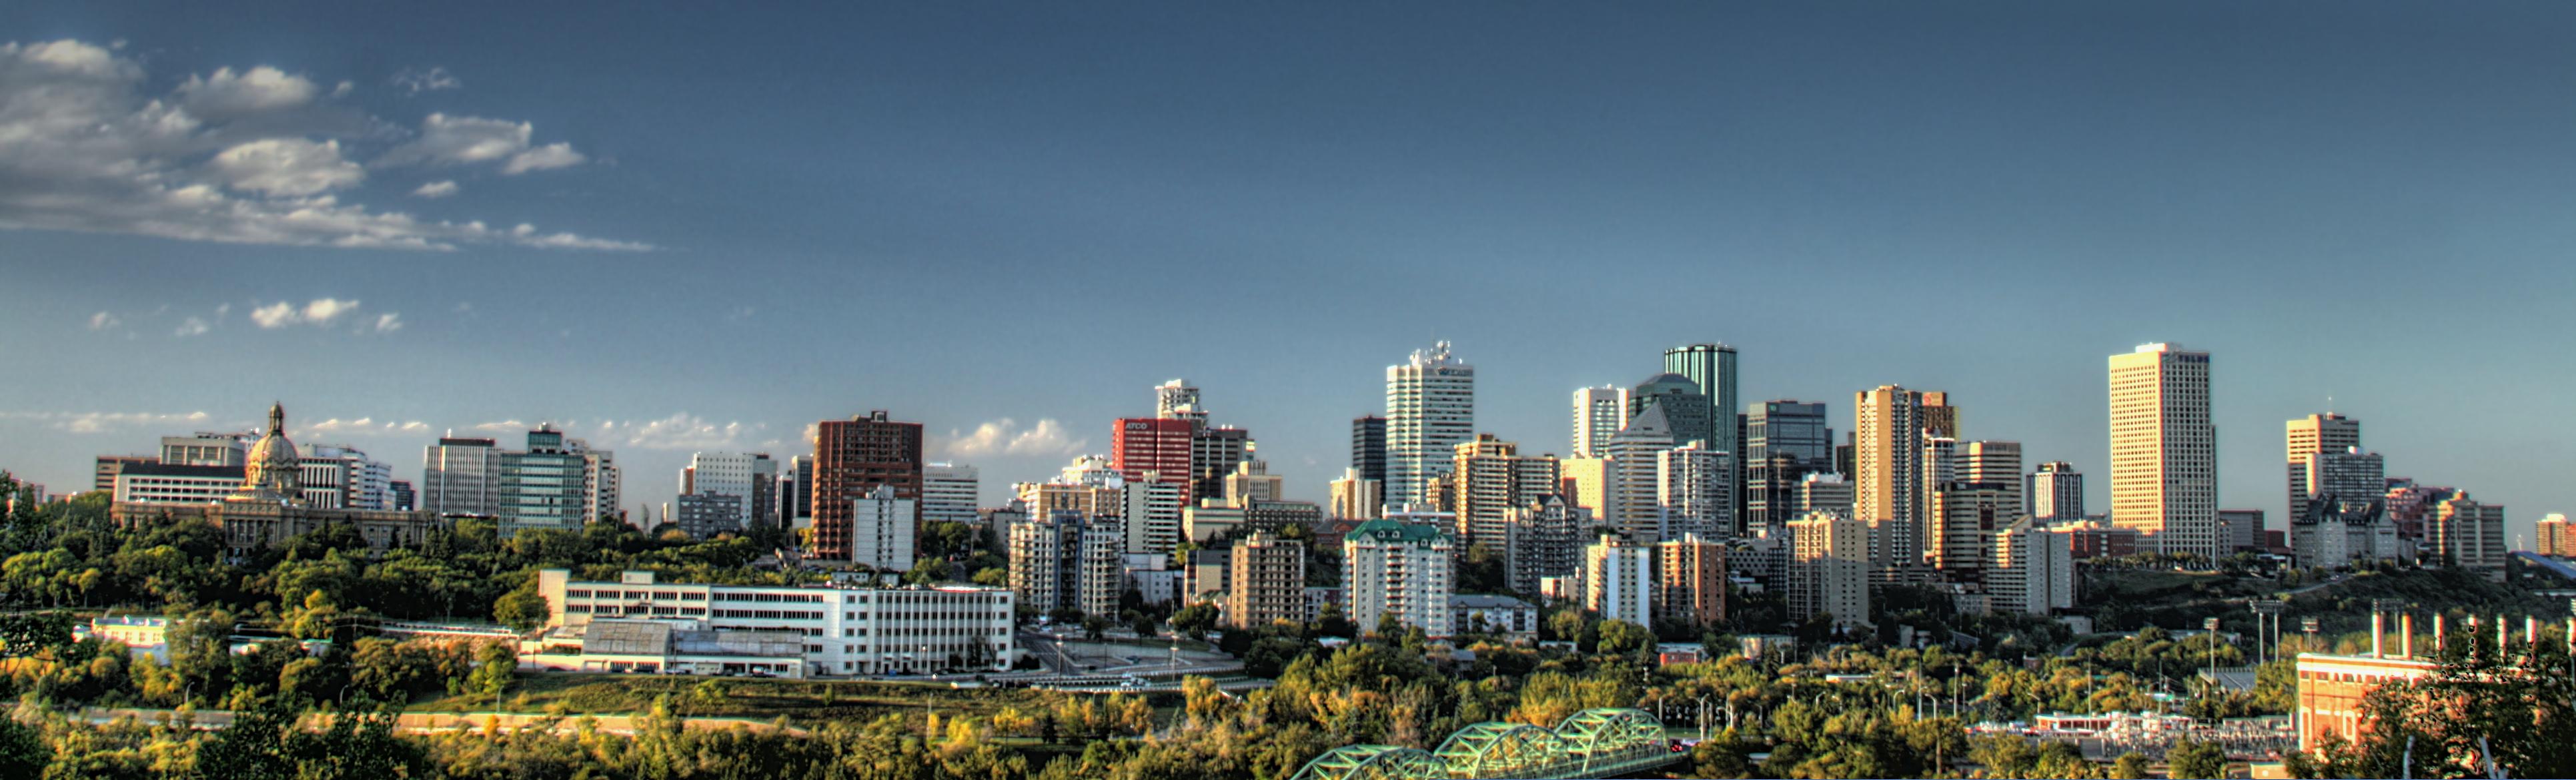 Edmonton, Alberta skyline